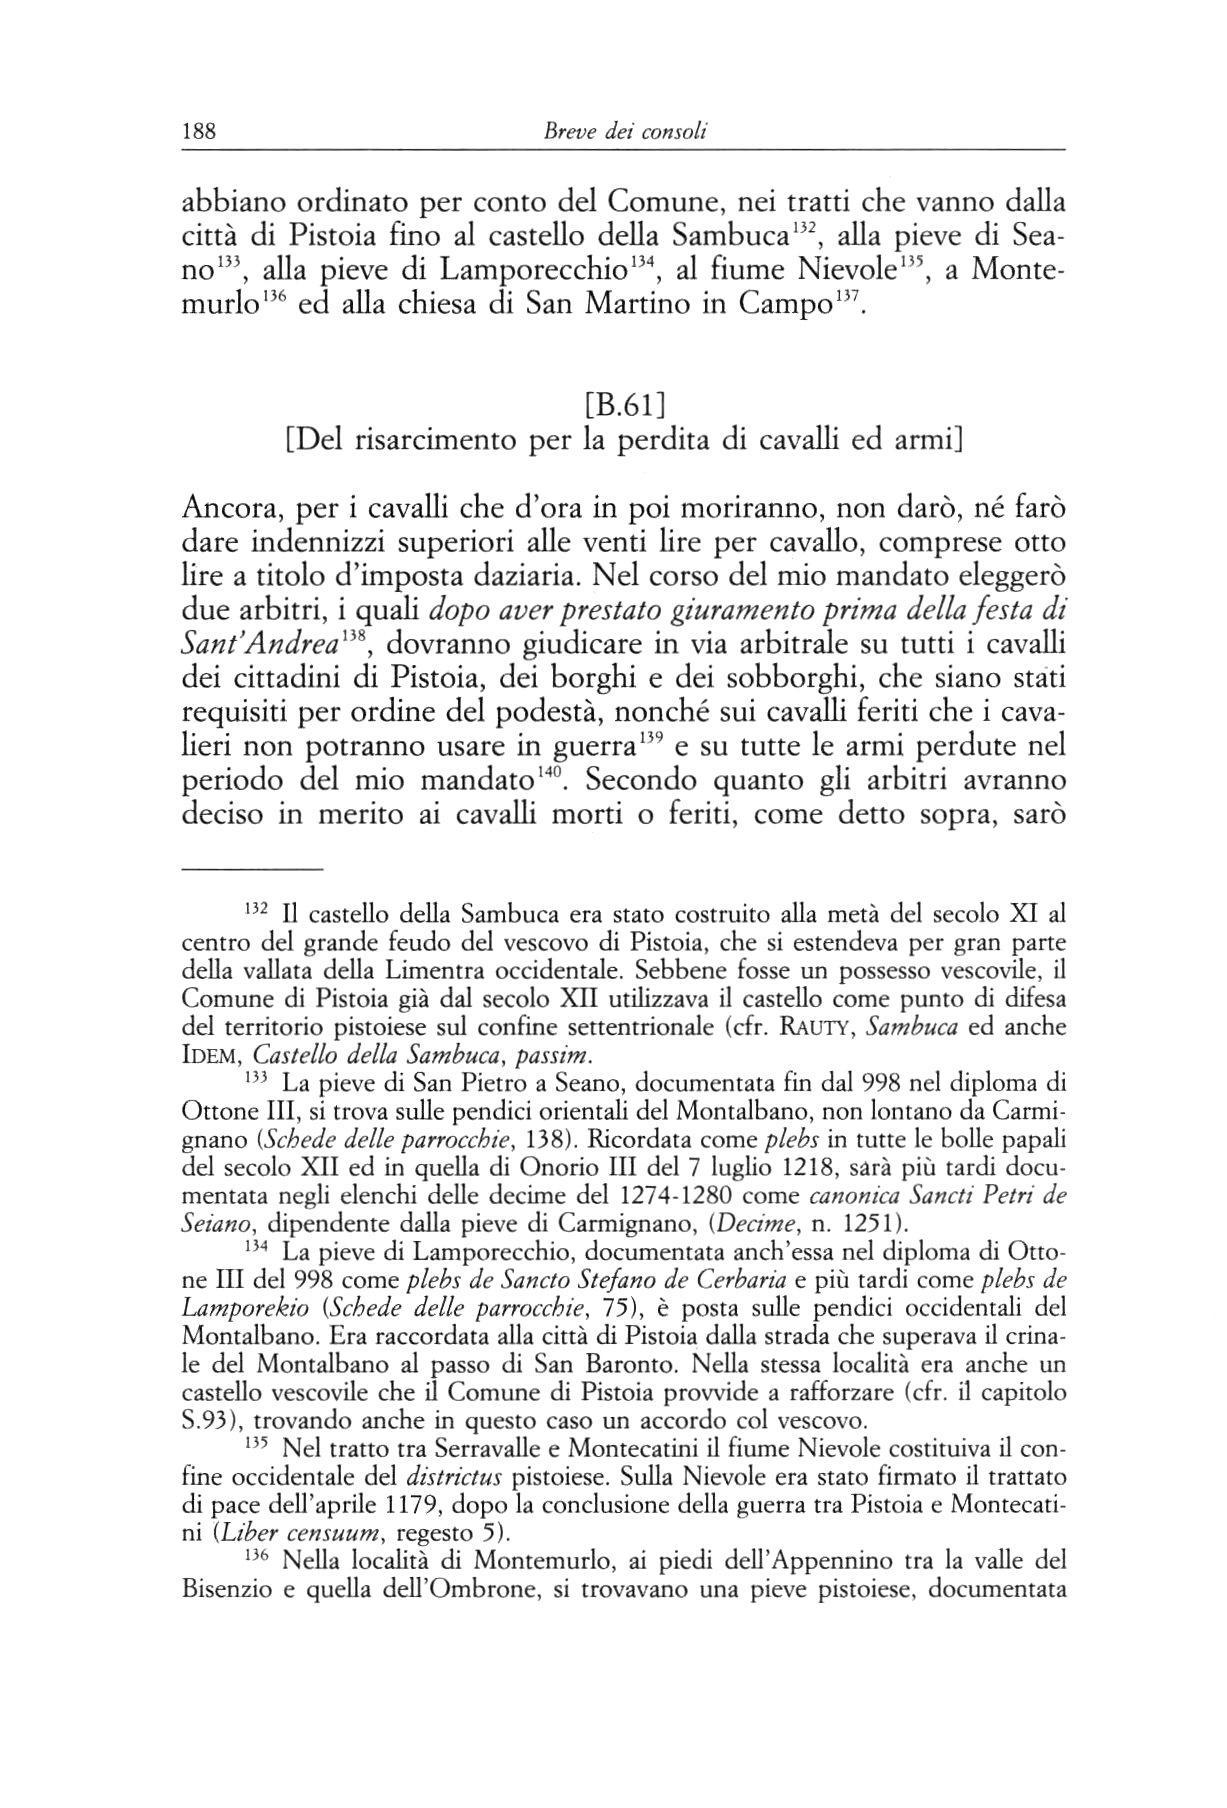 statuti pistoiesi del sec.XII 0188.jpg